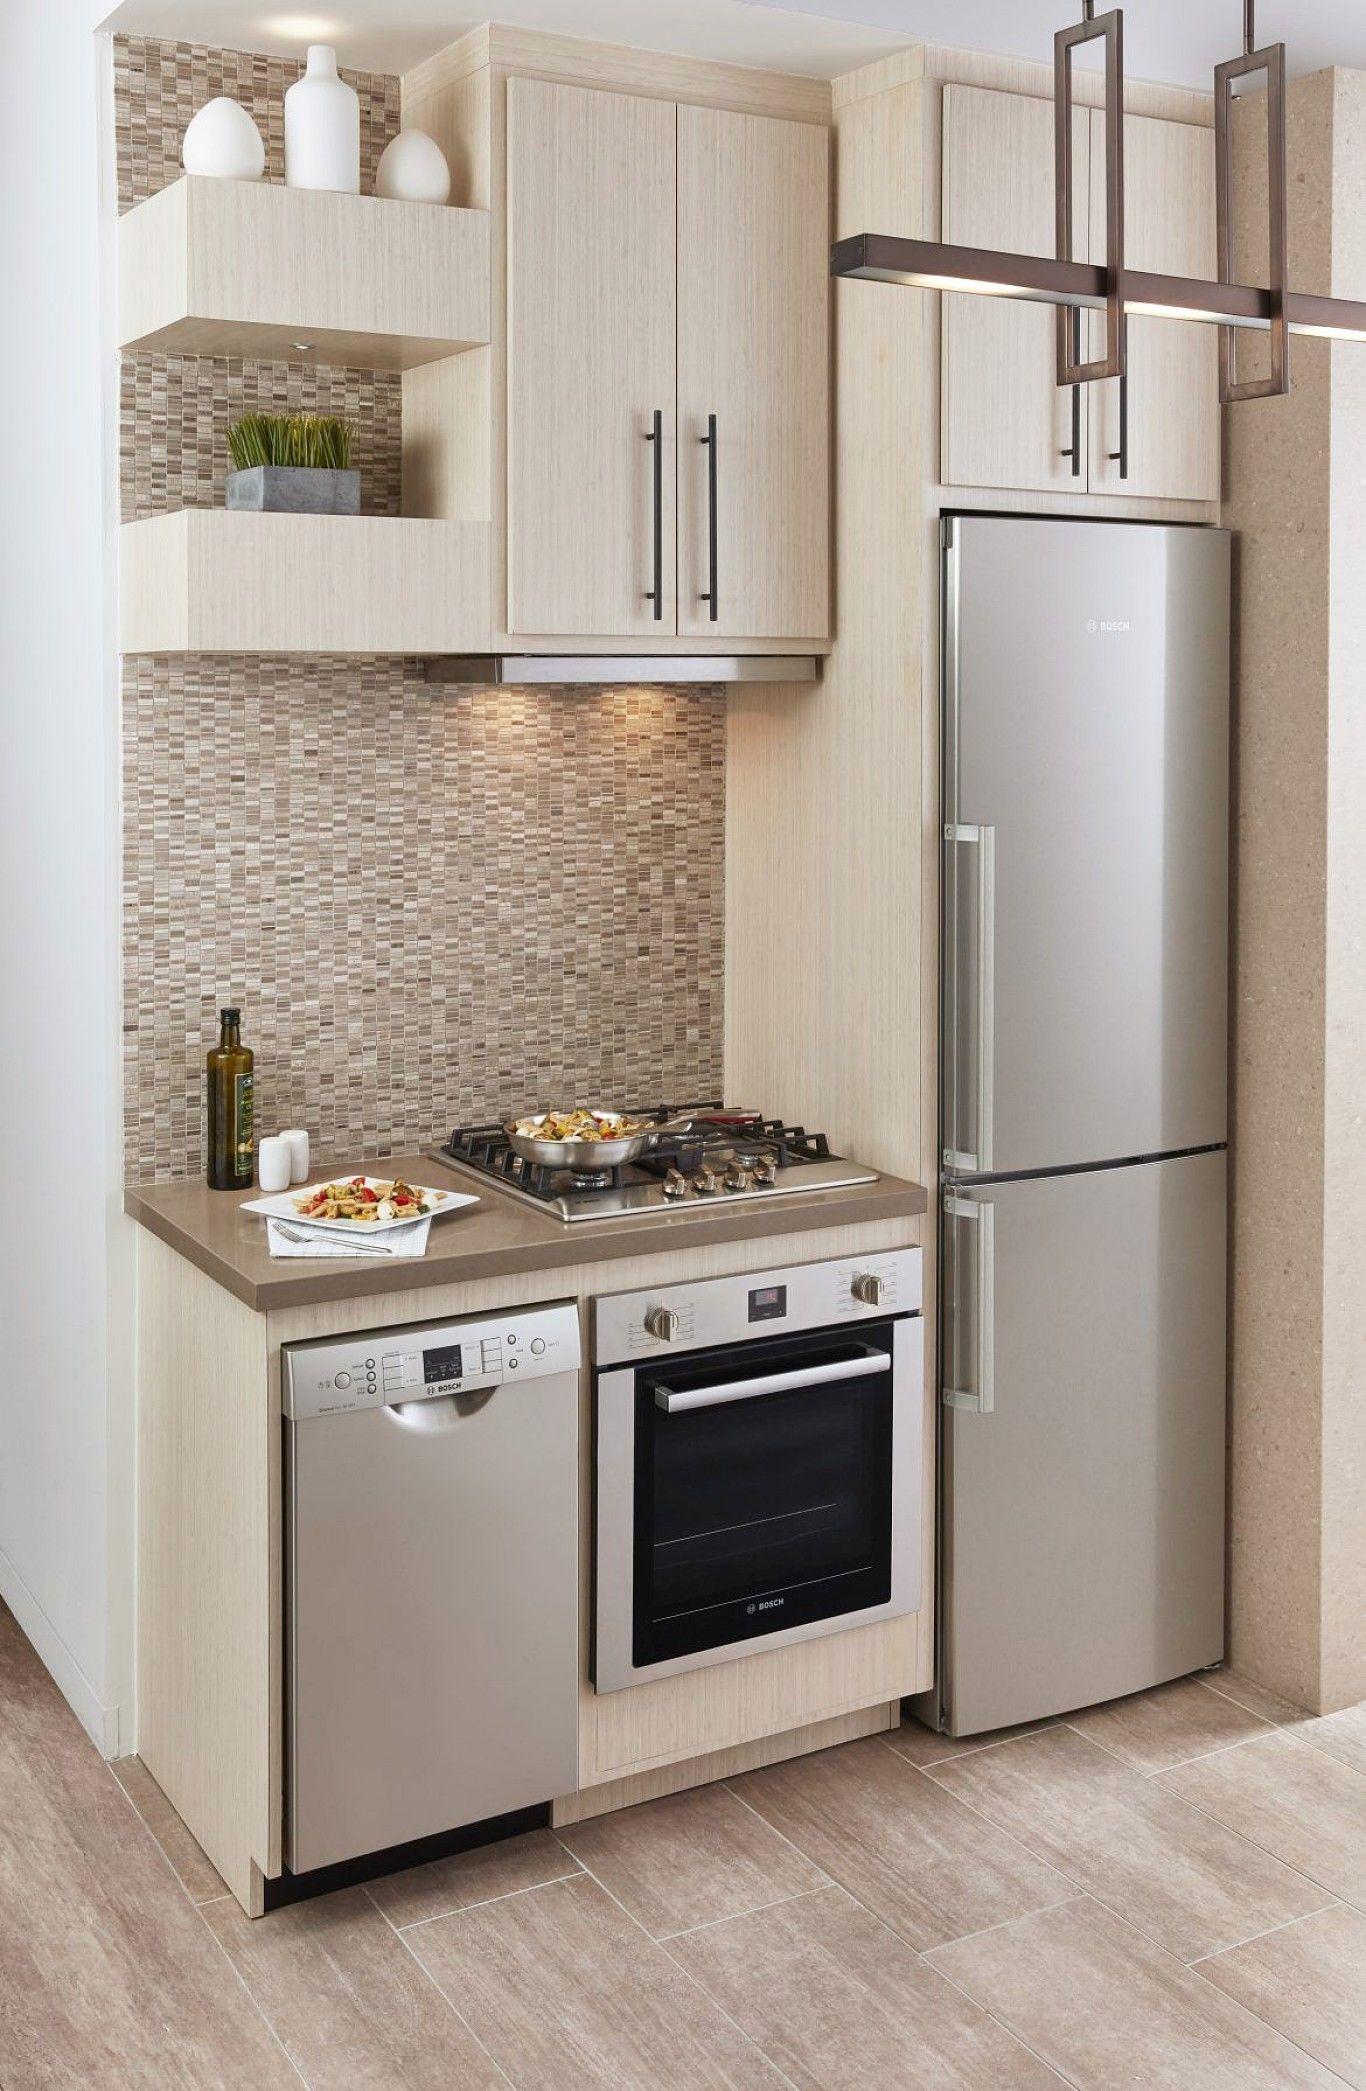 Charmant Kitchen:Basement Kitchen Ideas Kitchenette Design Plans Basement Appliances  Mother In Law Suite With Kitchenette